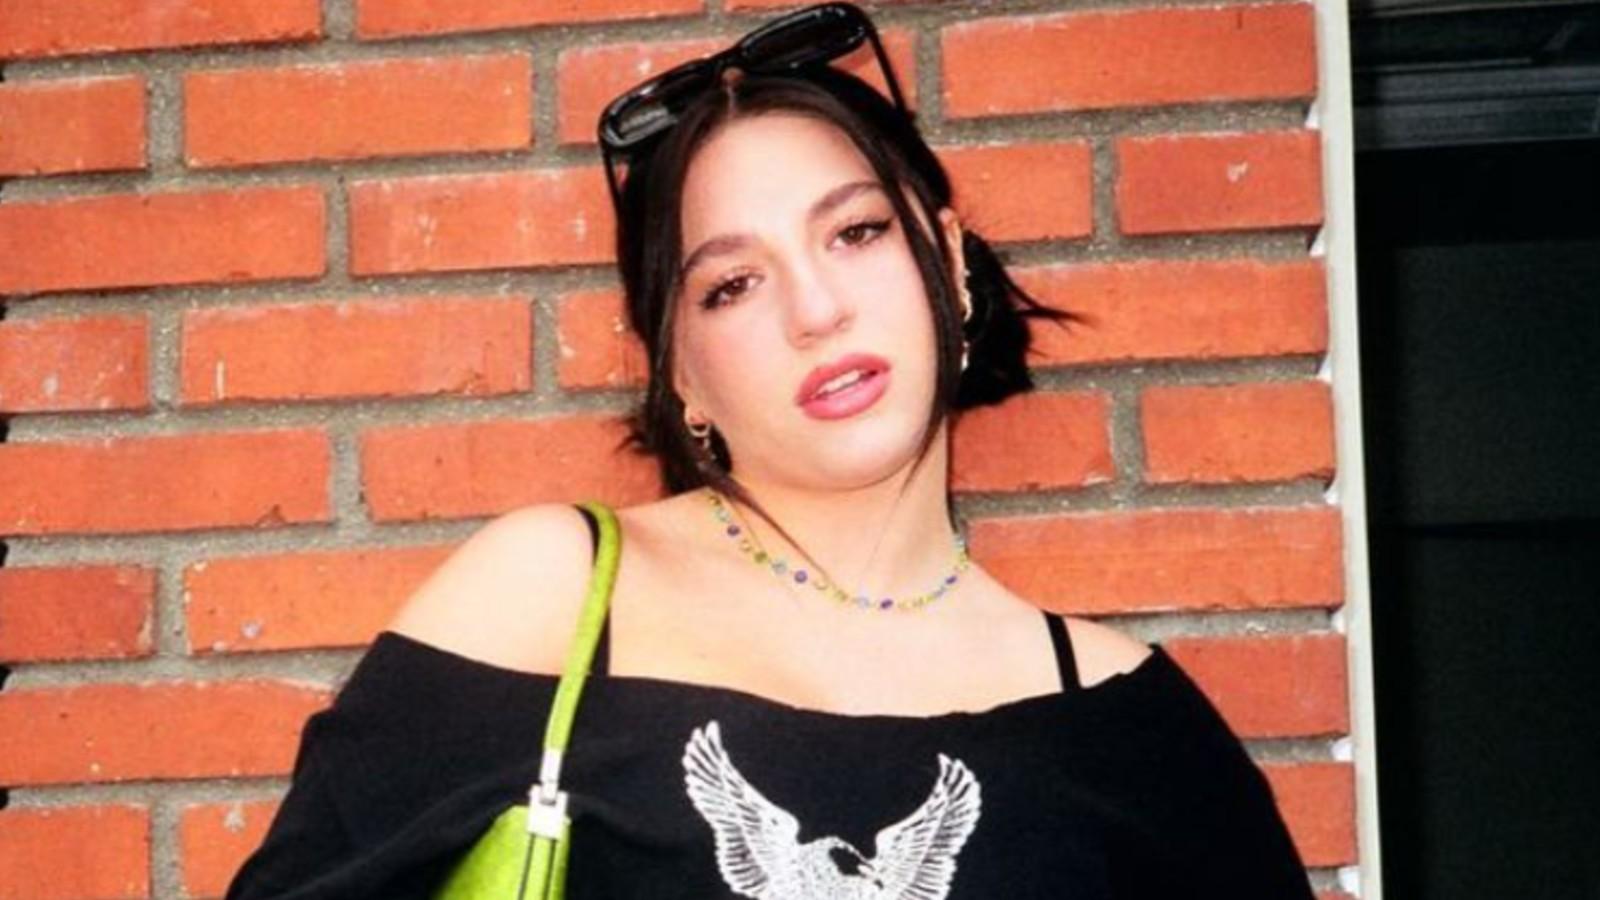 Kenzie Ziegler in front of a brick wall